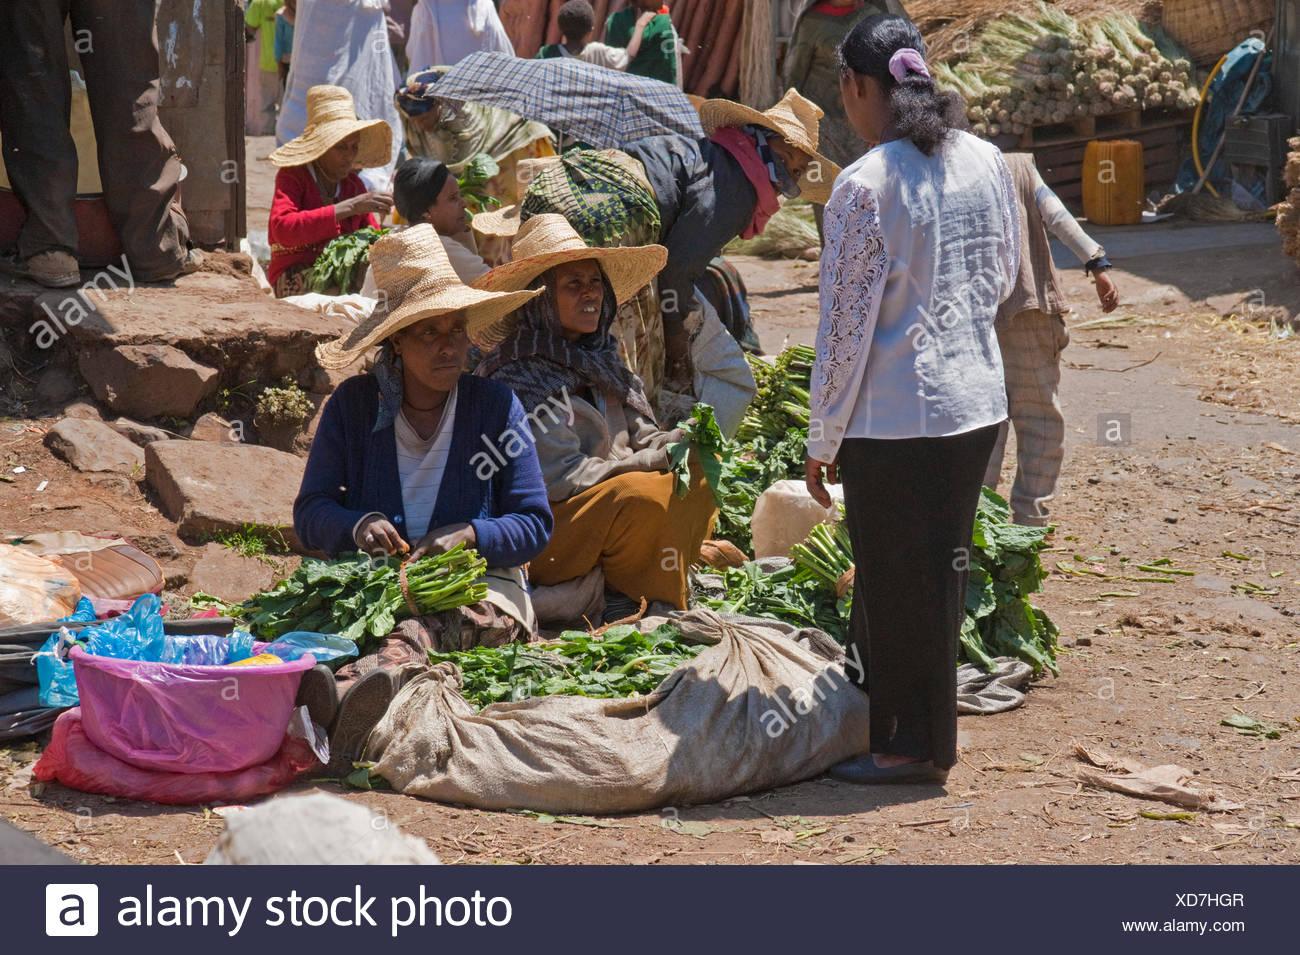 Market scene in the Mercato in Addis Ababa, Addis Abeba - Stock Image